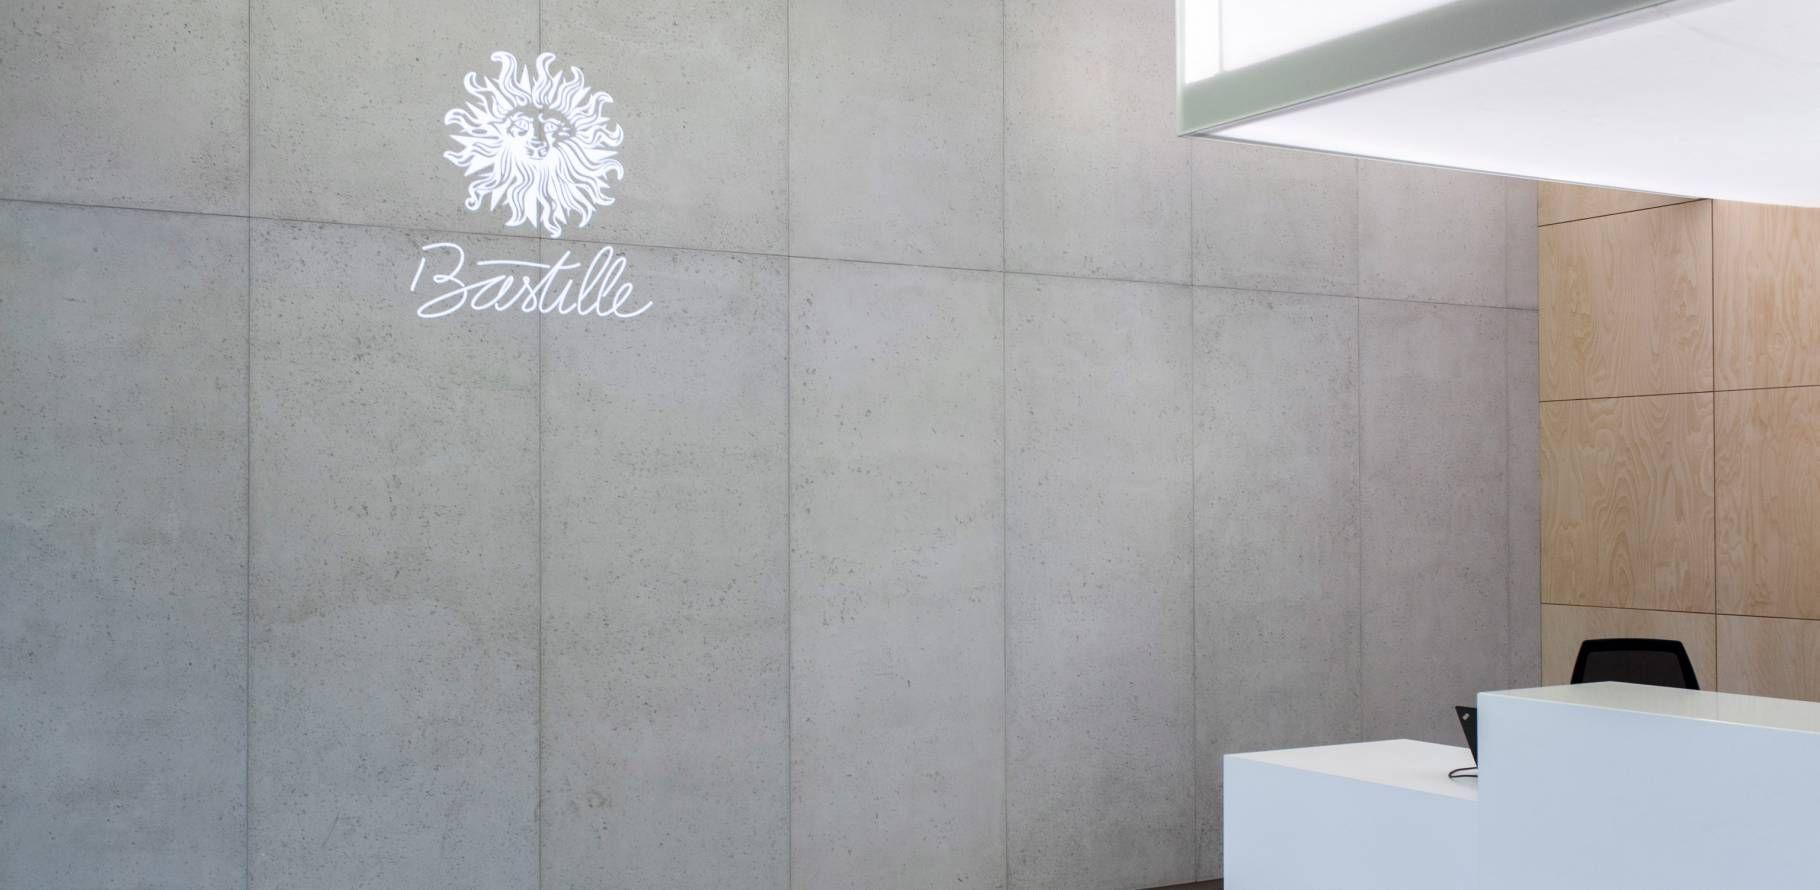 Publicis Bastille Habillage Mural En Panbeton Habillage Mural